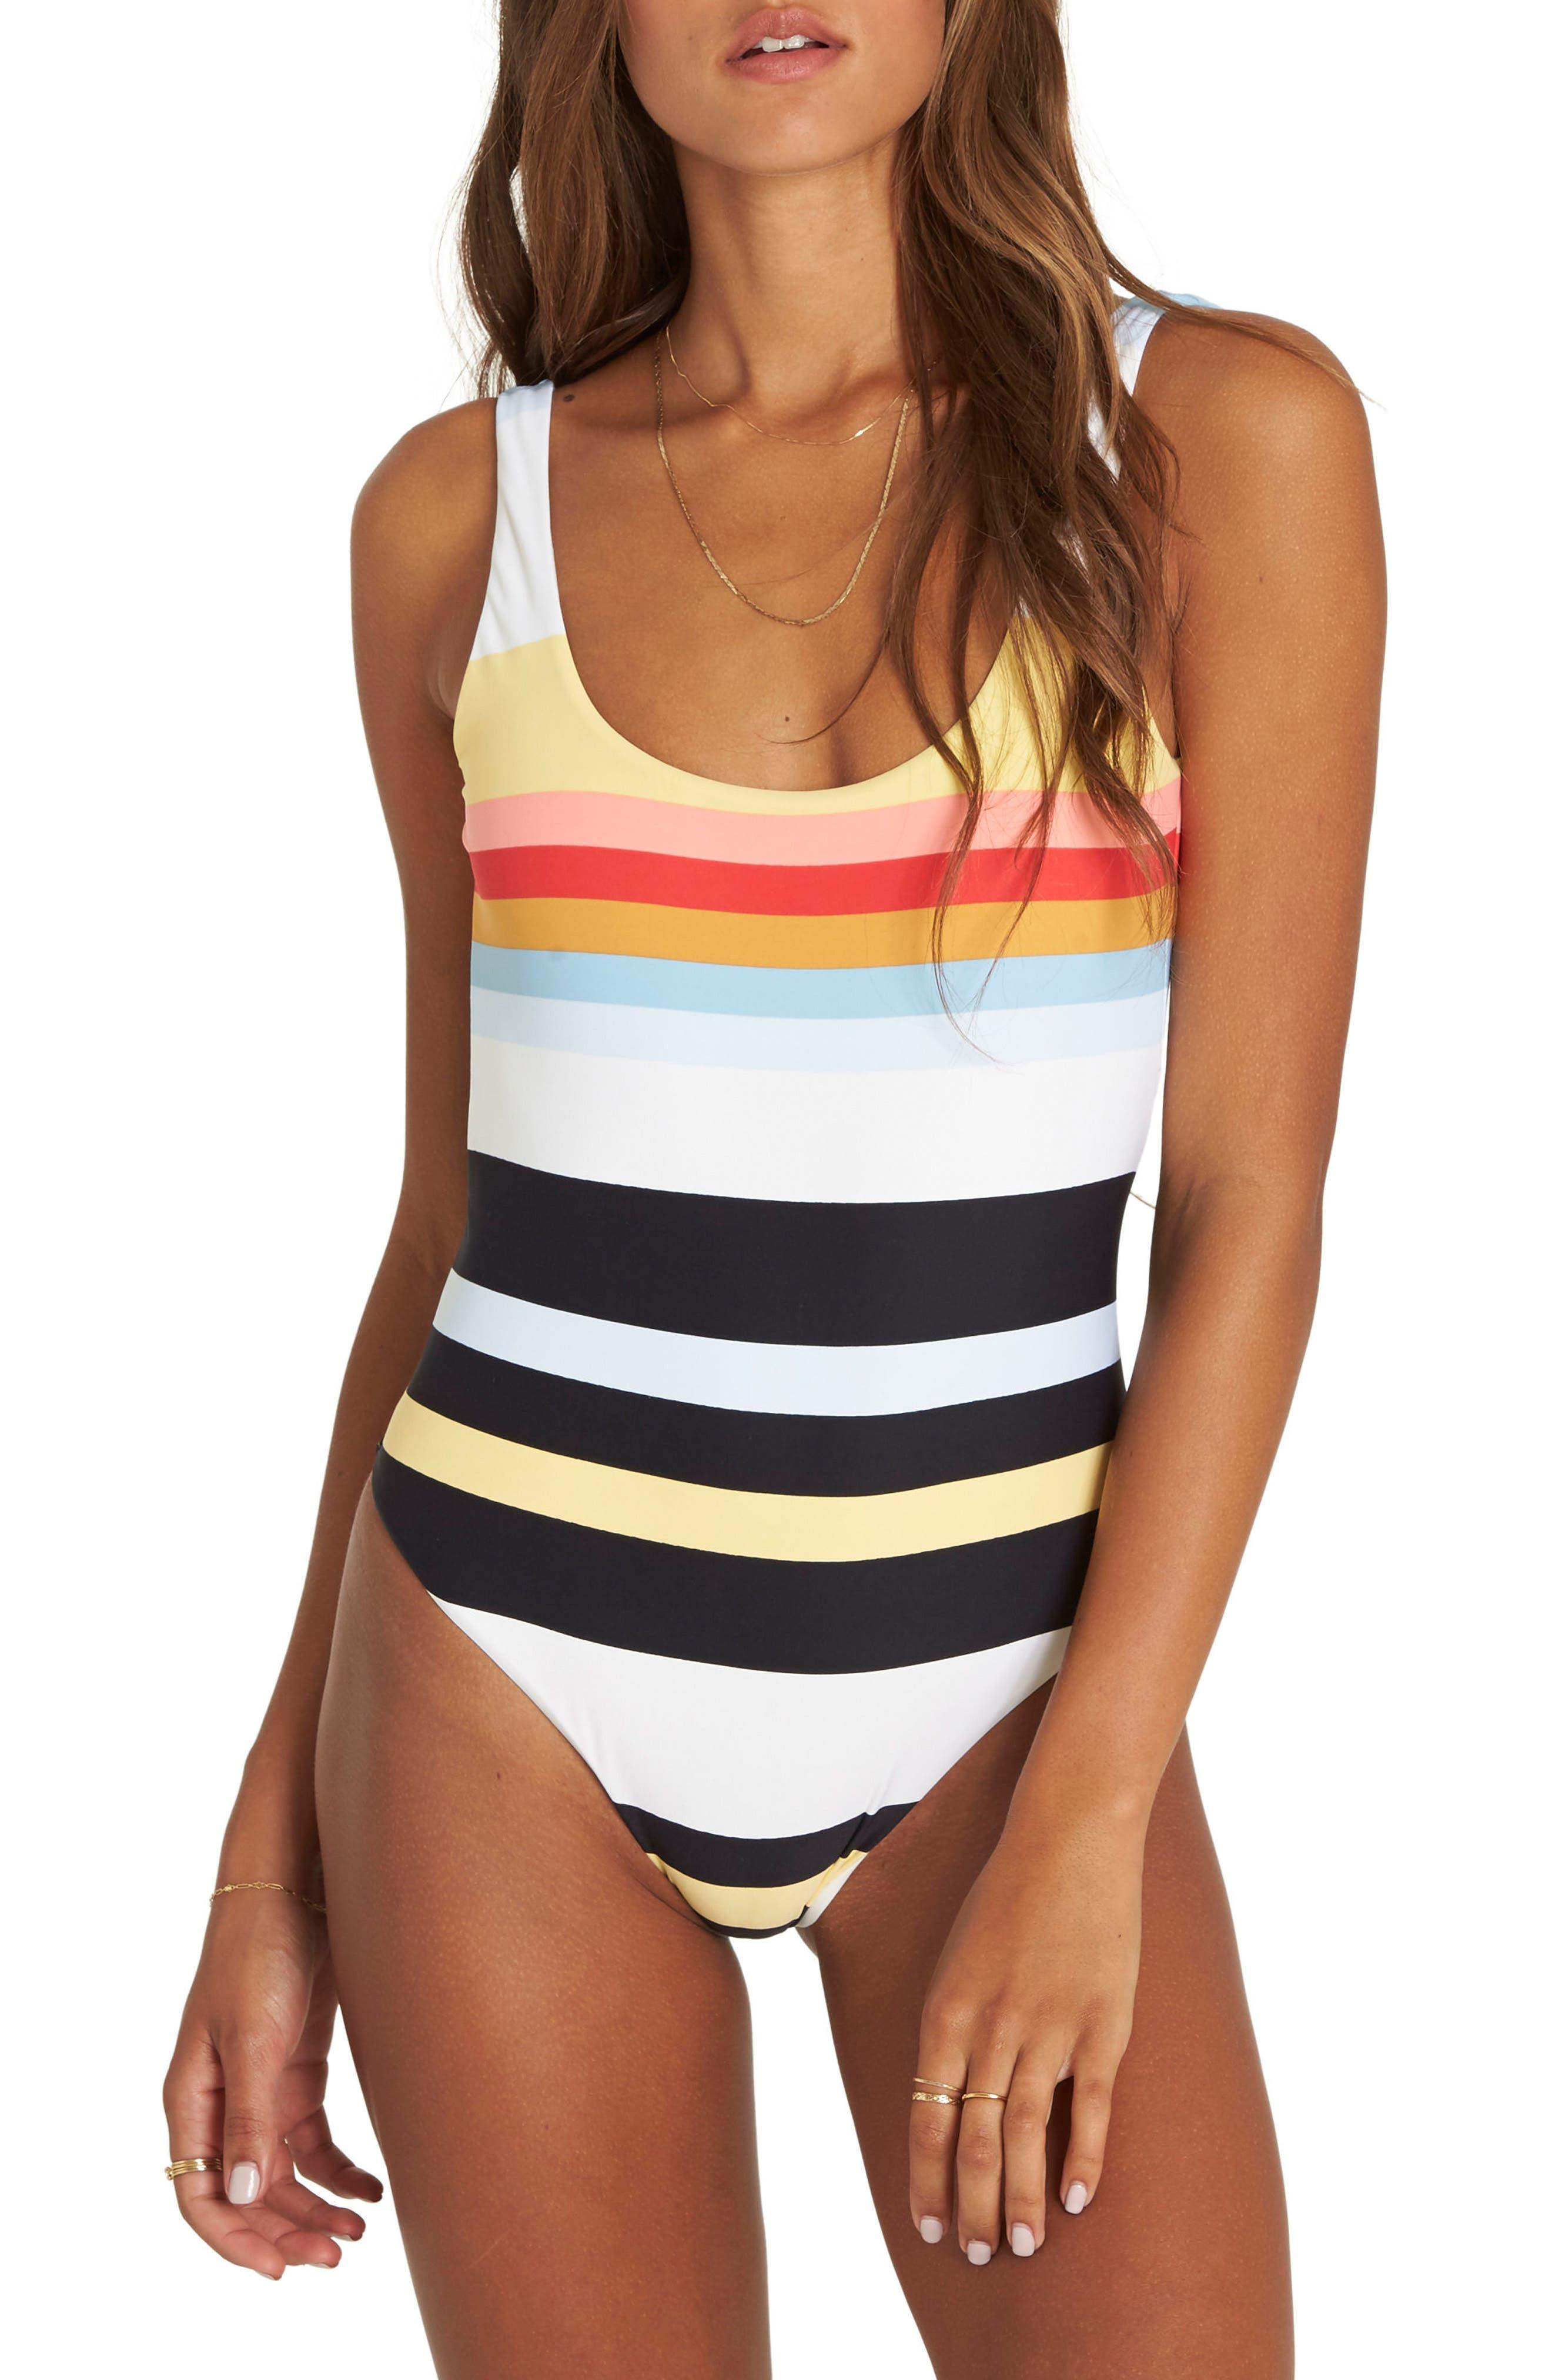 Baja Break One-Piece Swimsuit,                         Main,                         color, White Multi